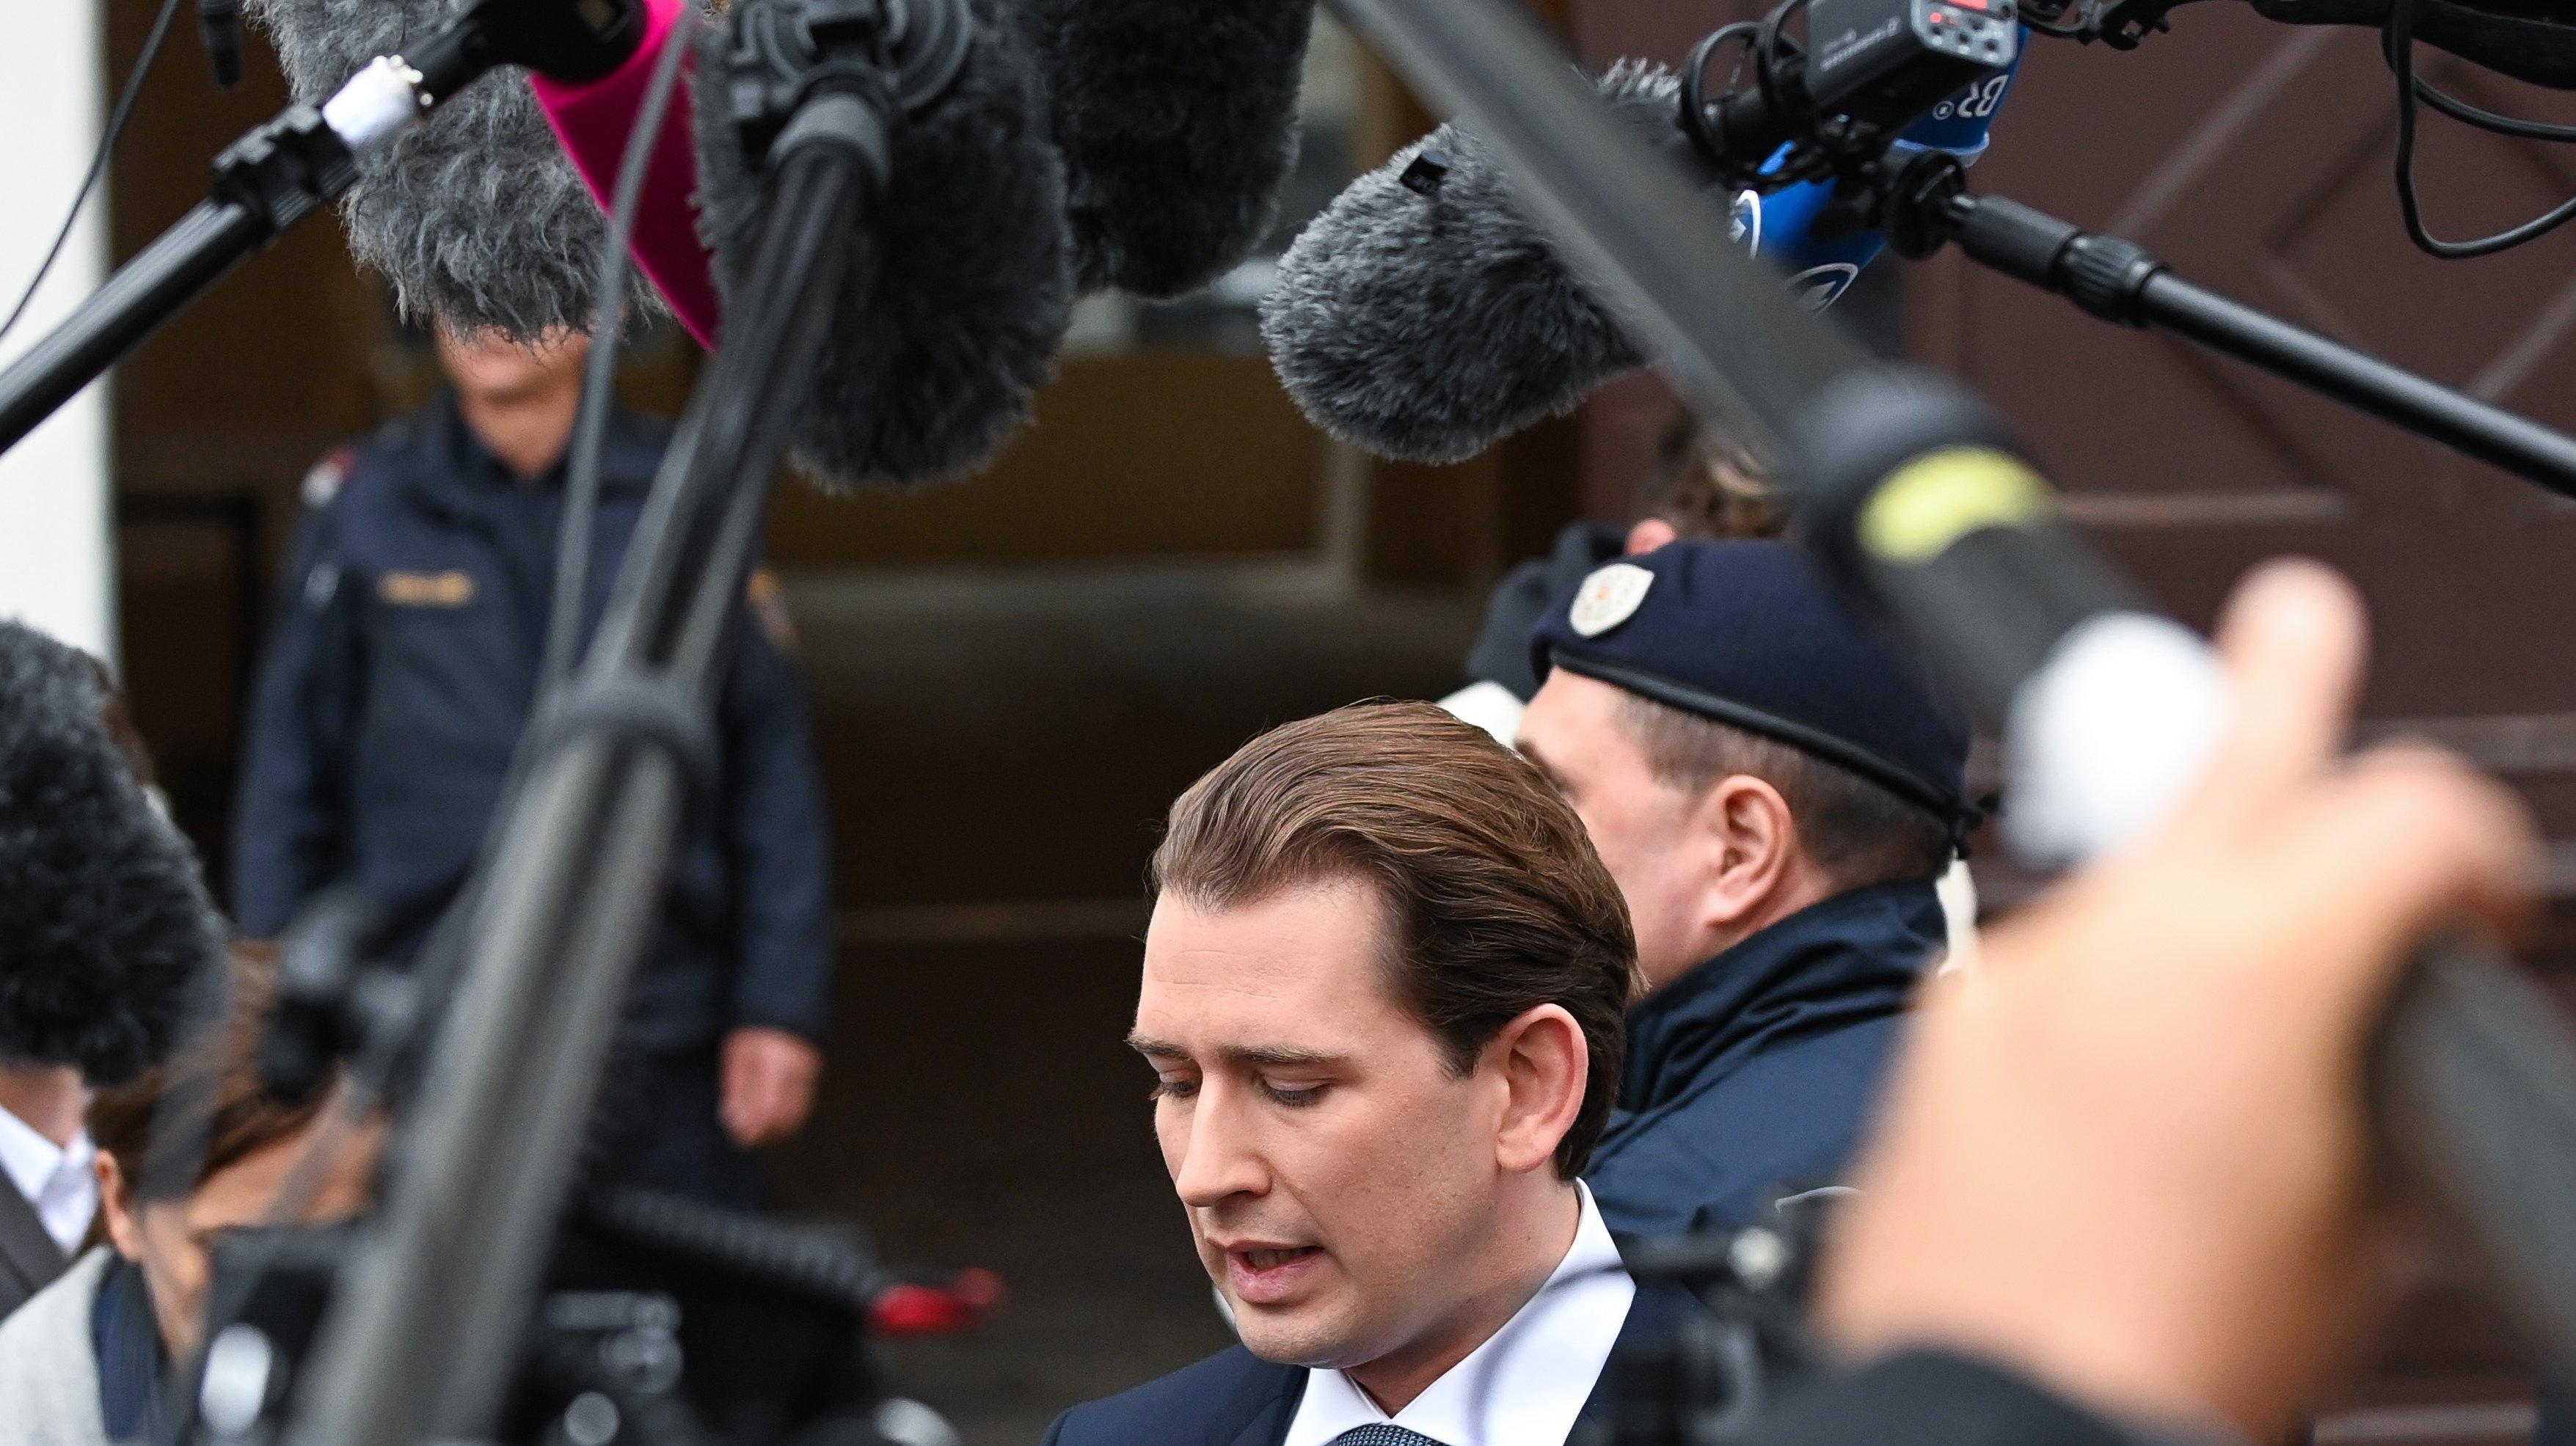 Kurz Meets With President Van Der Bellen Amid Corruption Investigation